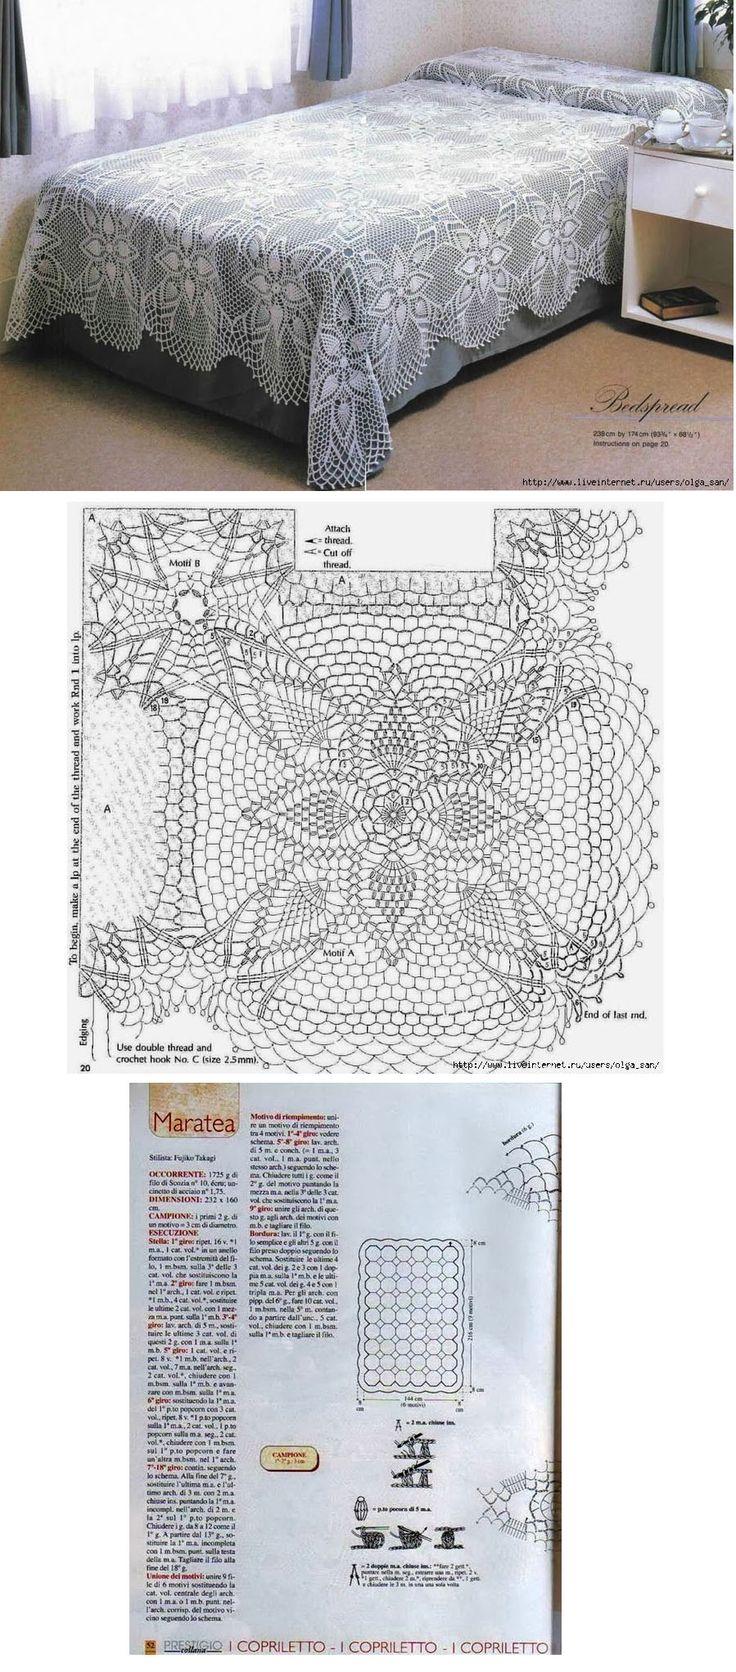 199 best Knit/Crochet Afghans, Blankets, Bedding images on Pinterest ...